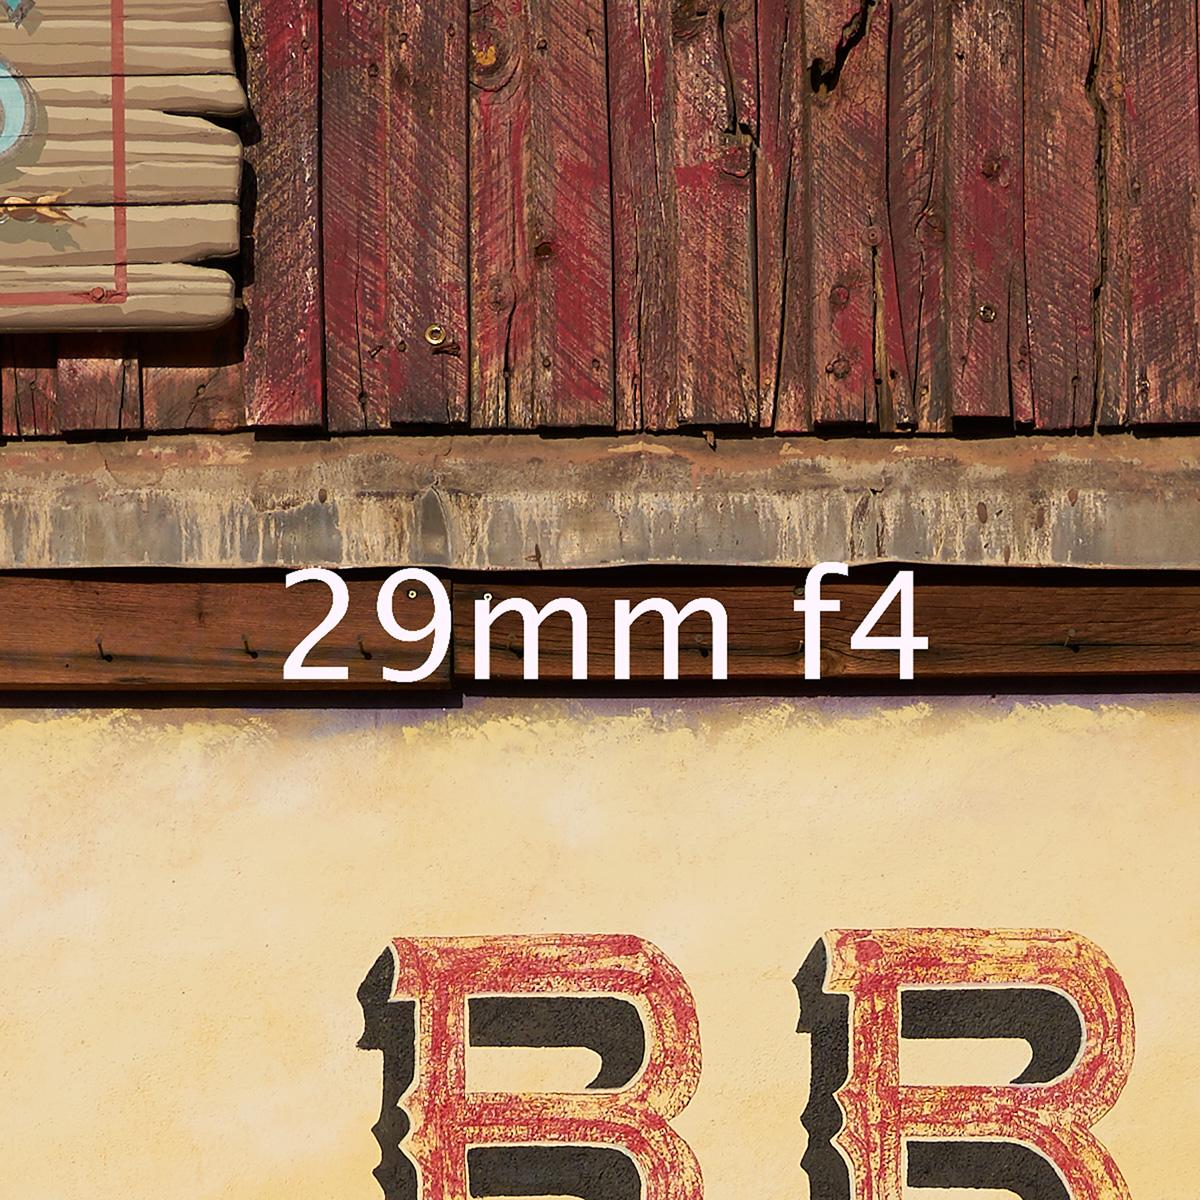 29mm f4 102643 by Guy Mancuso in Guy Mancuso